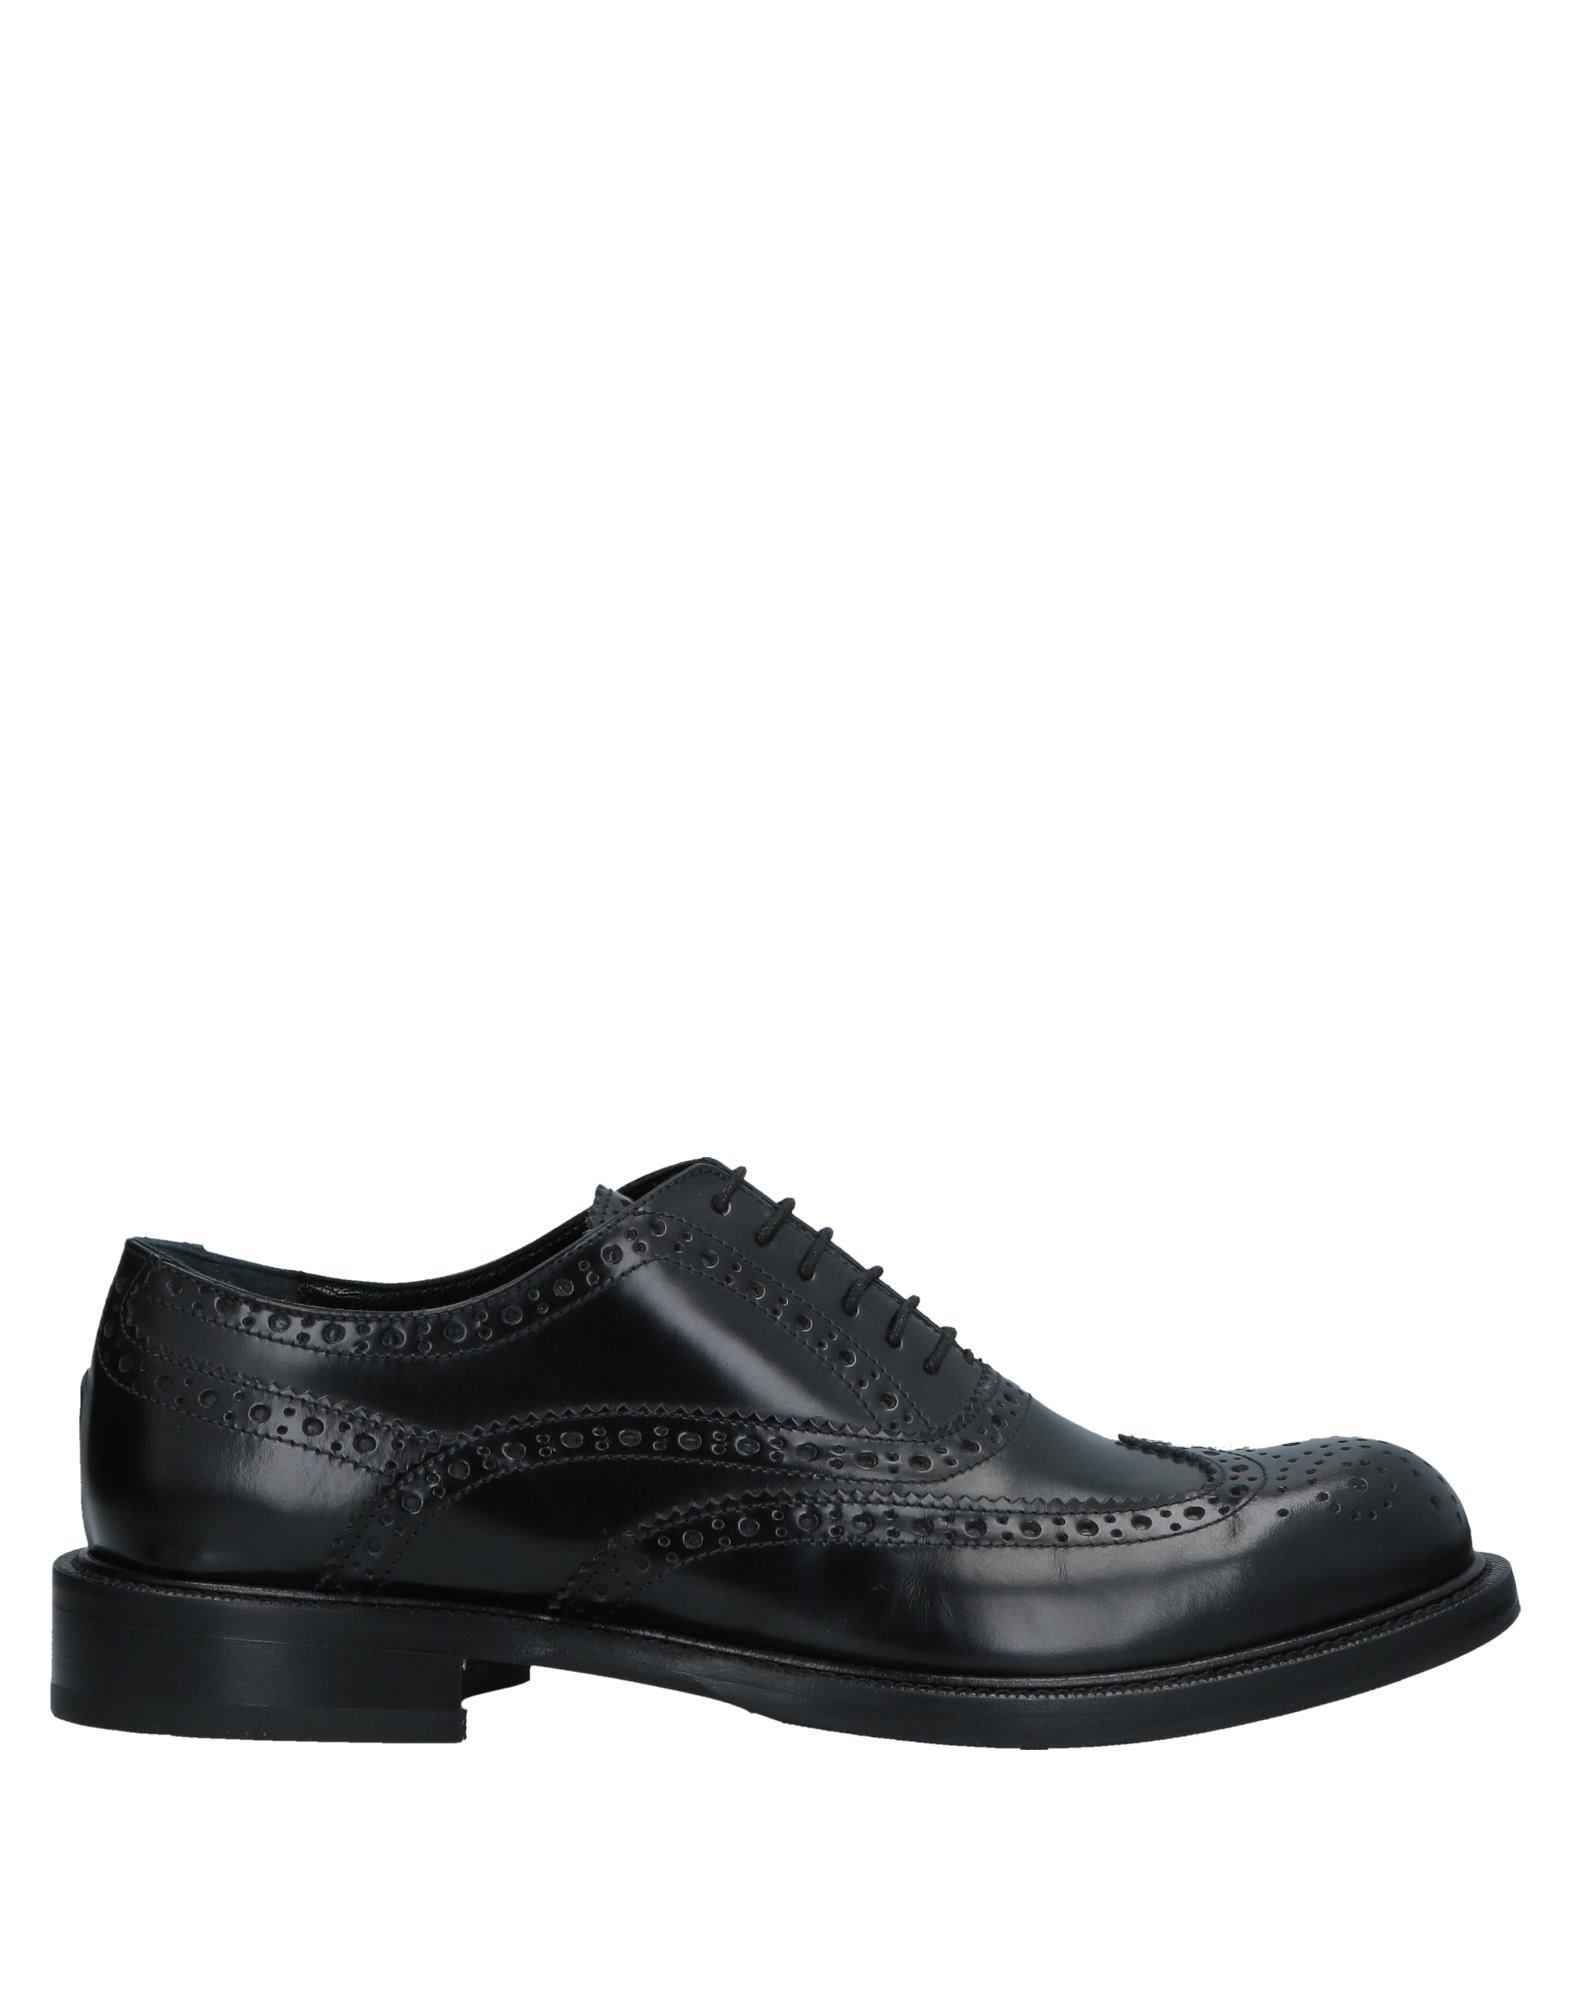 NENÉ INSPIRE THE WORLD Обувь на шнурках цены онлайн